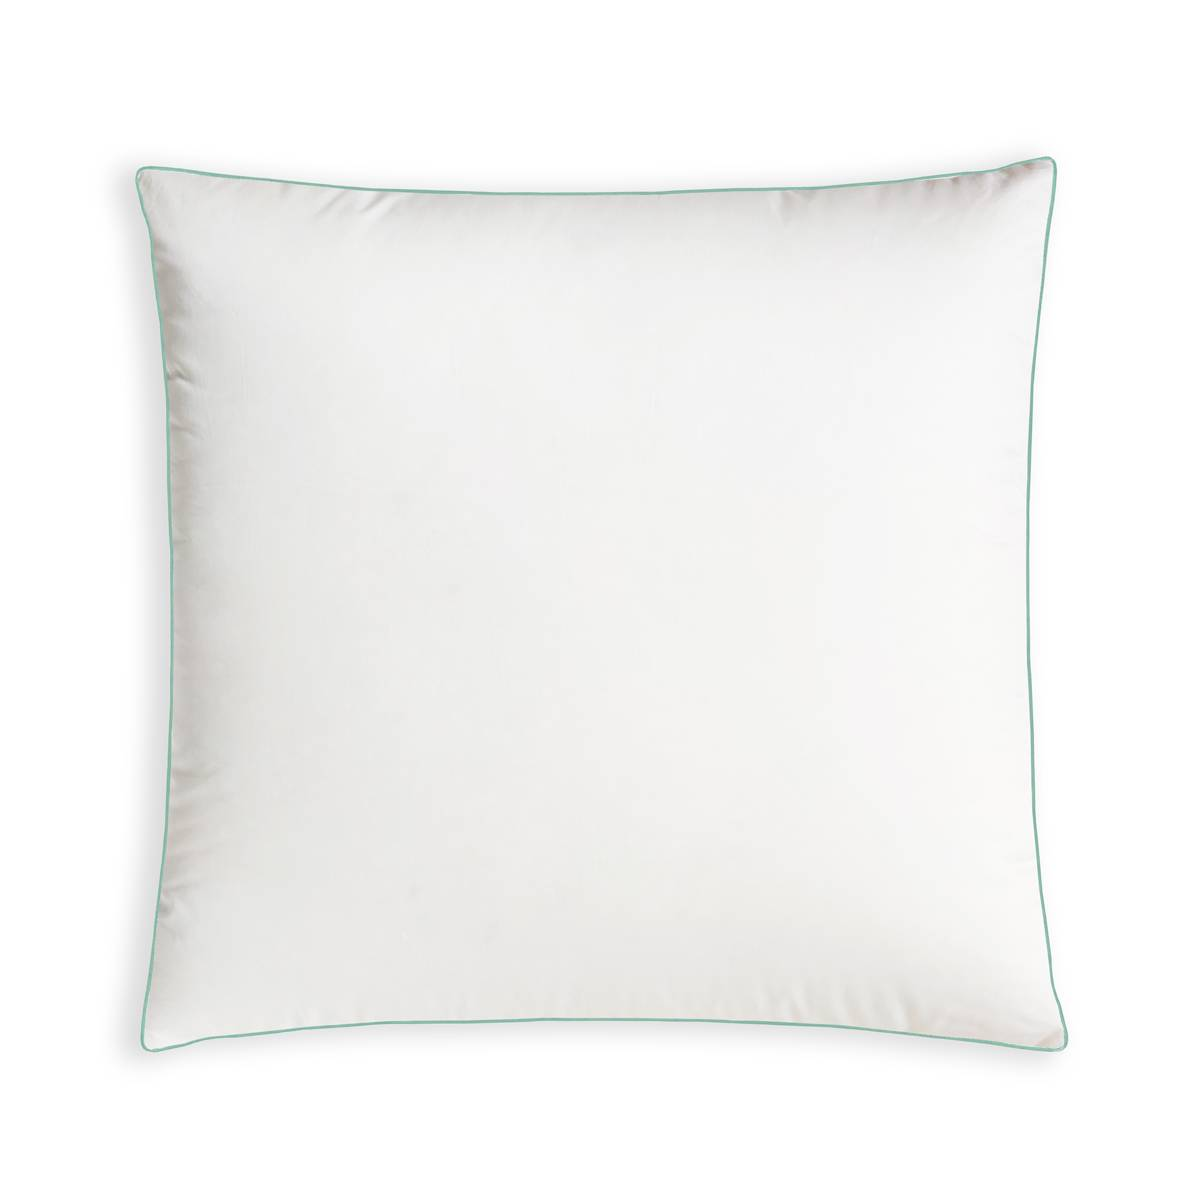 WAKE ME GREEN Oreiller FERME Gonflant Durable - Coton Bio  60x60 cm